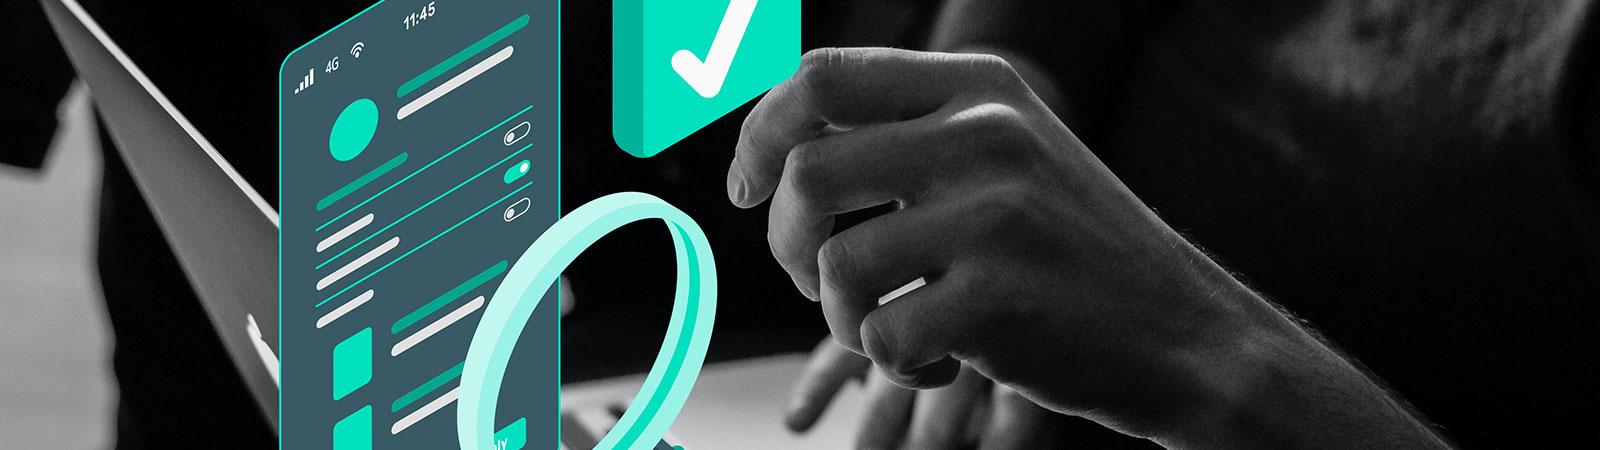 SaaS-based Online Employee Survey System